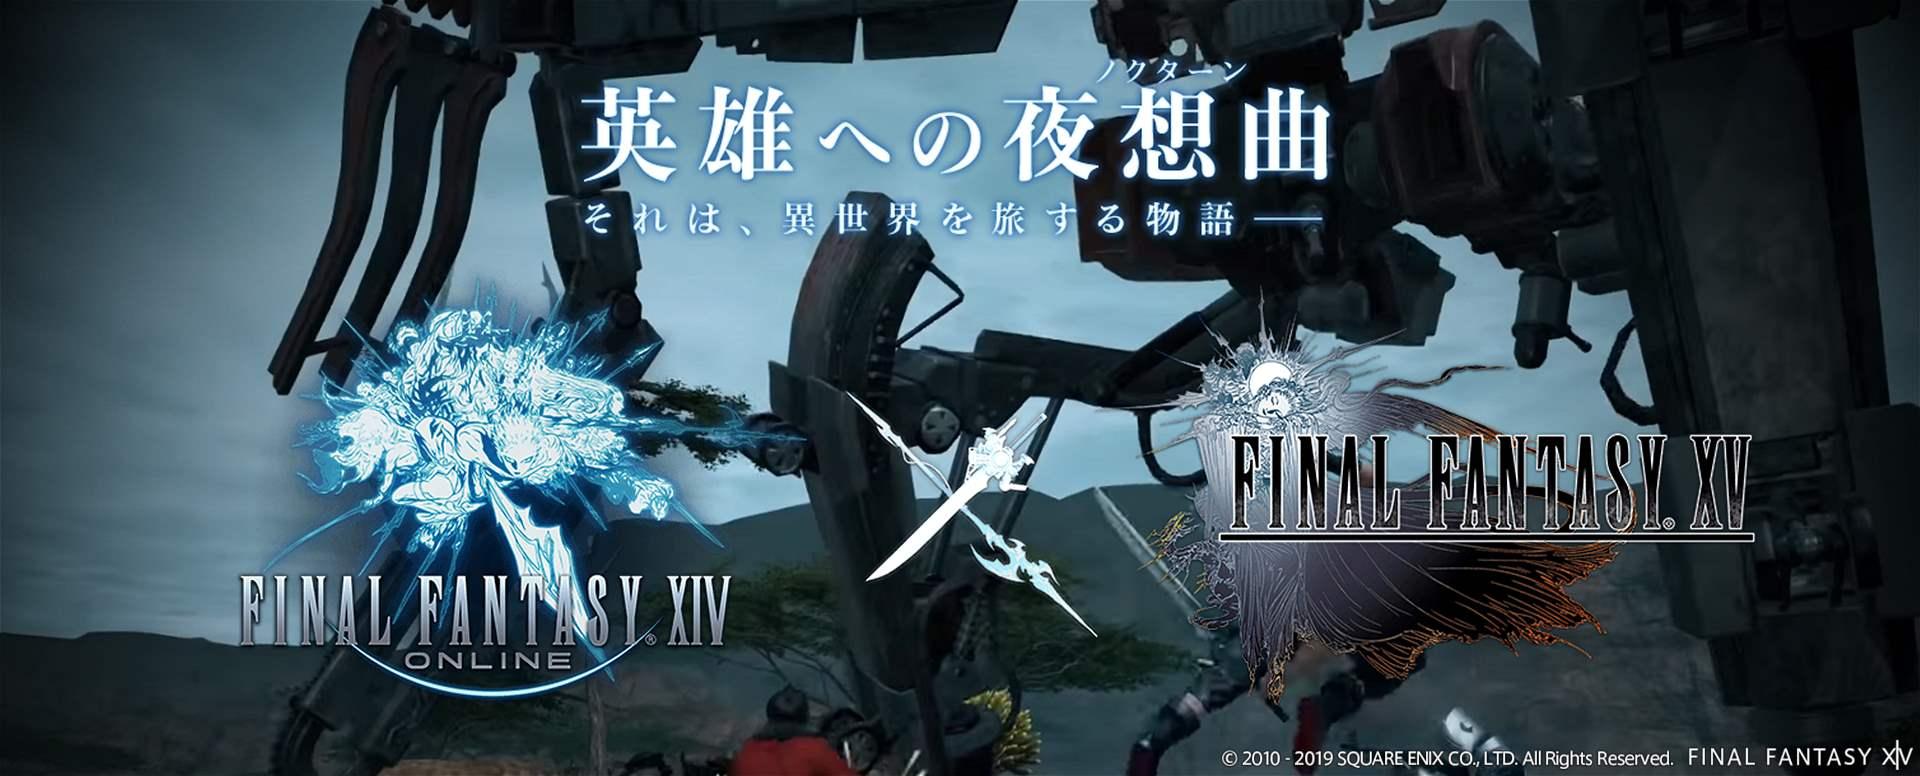 【FF14】FF14 × FF15 コラボ「英雄への夜想曲」本日2019年4月16日17時より開始!